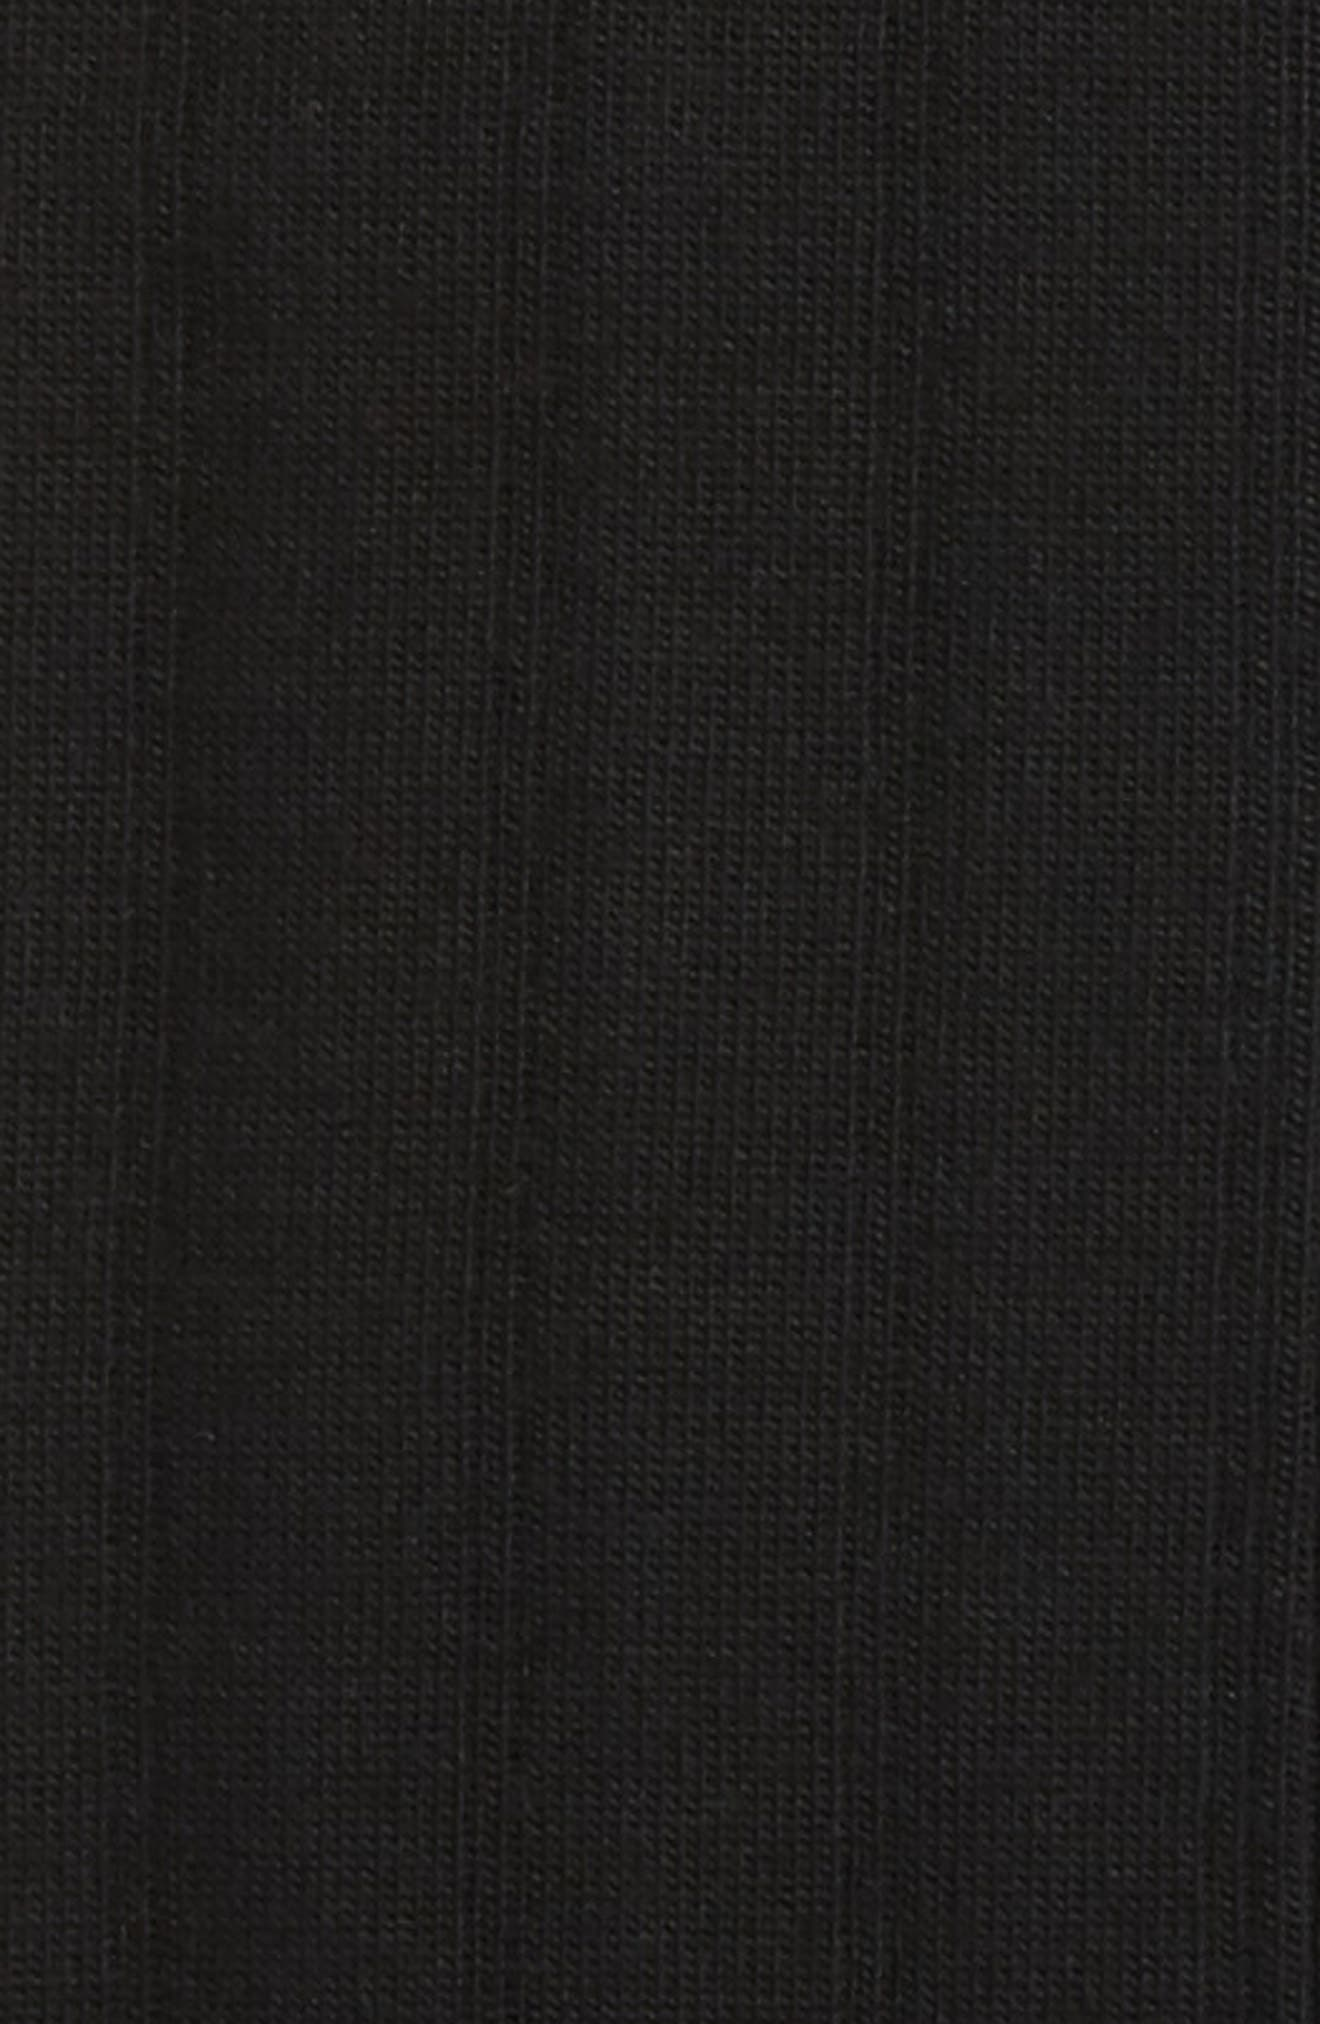 Nordstrom Mens Shop Over the Calf Wool Socks,                             Alternate thumbnail 3, color,                             BLACK